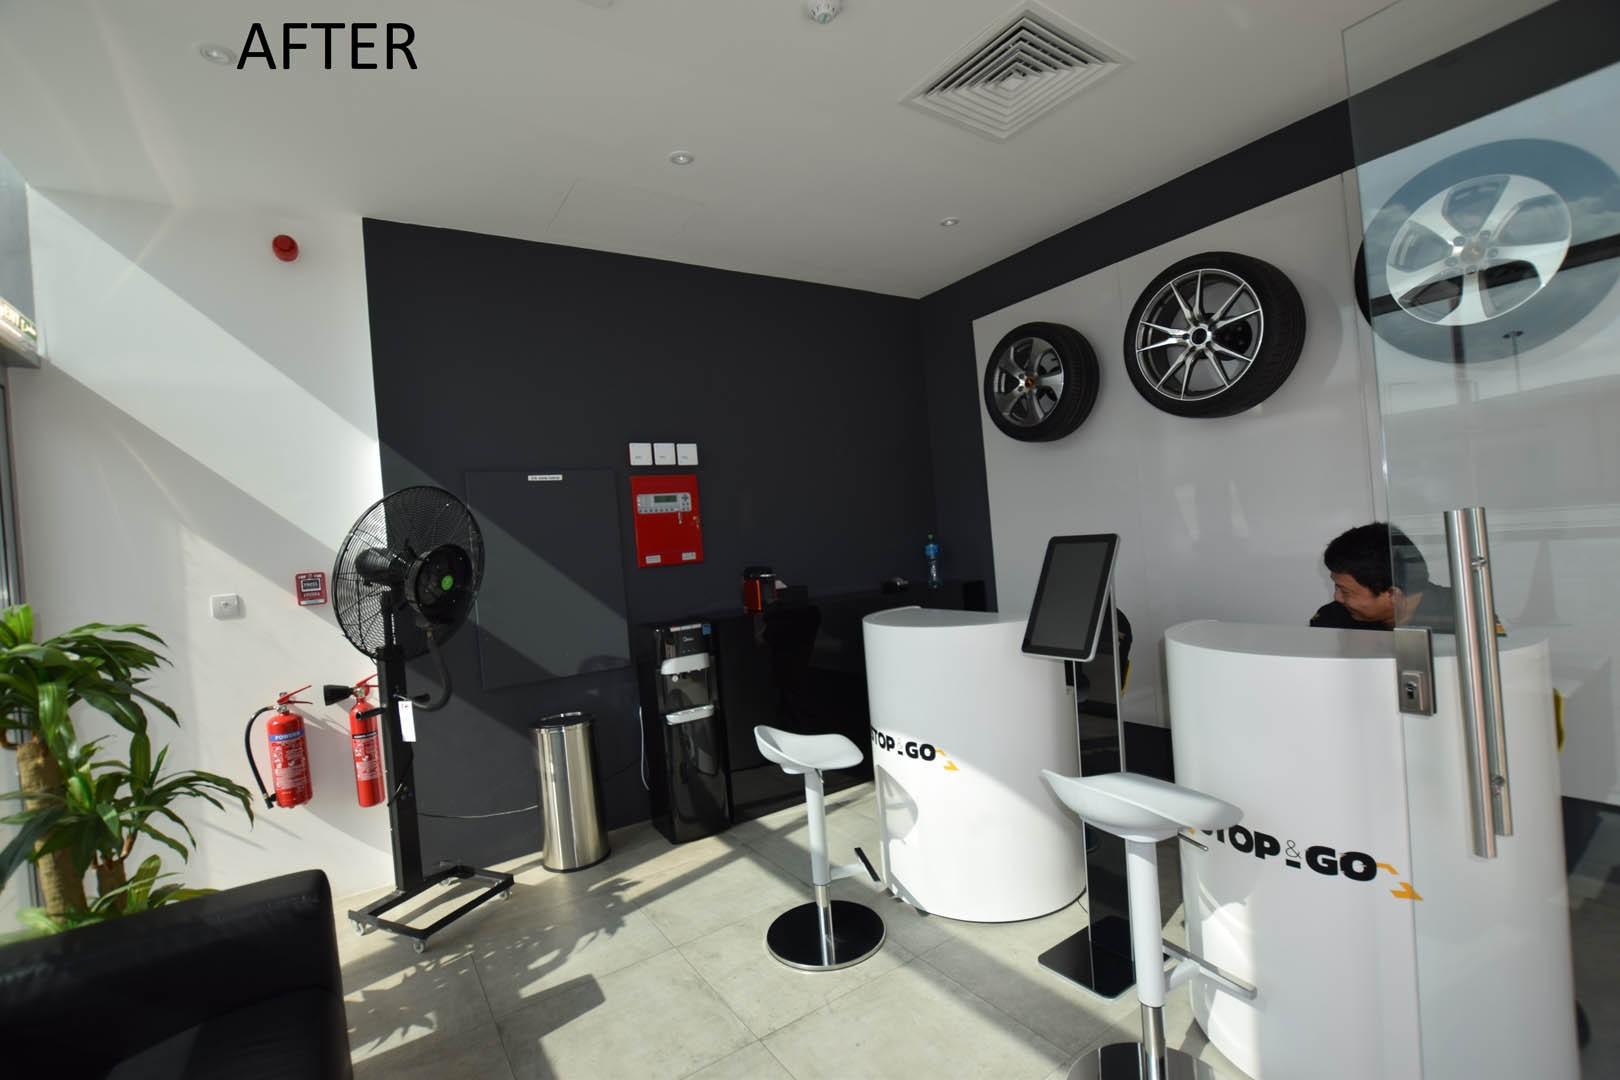 Stop & Go Tyre Shop